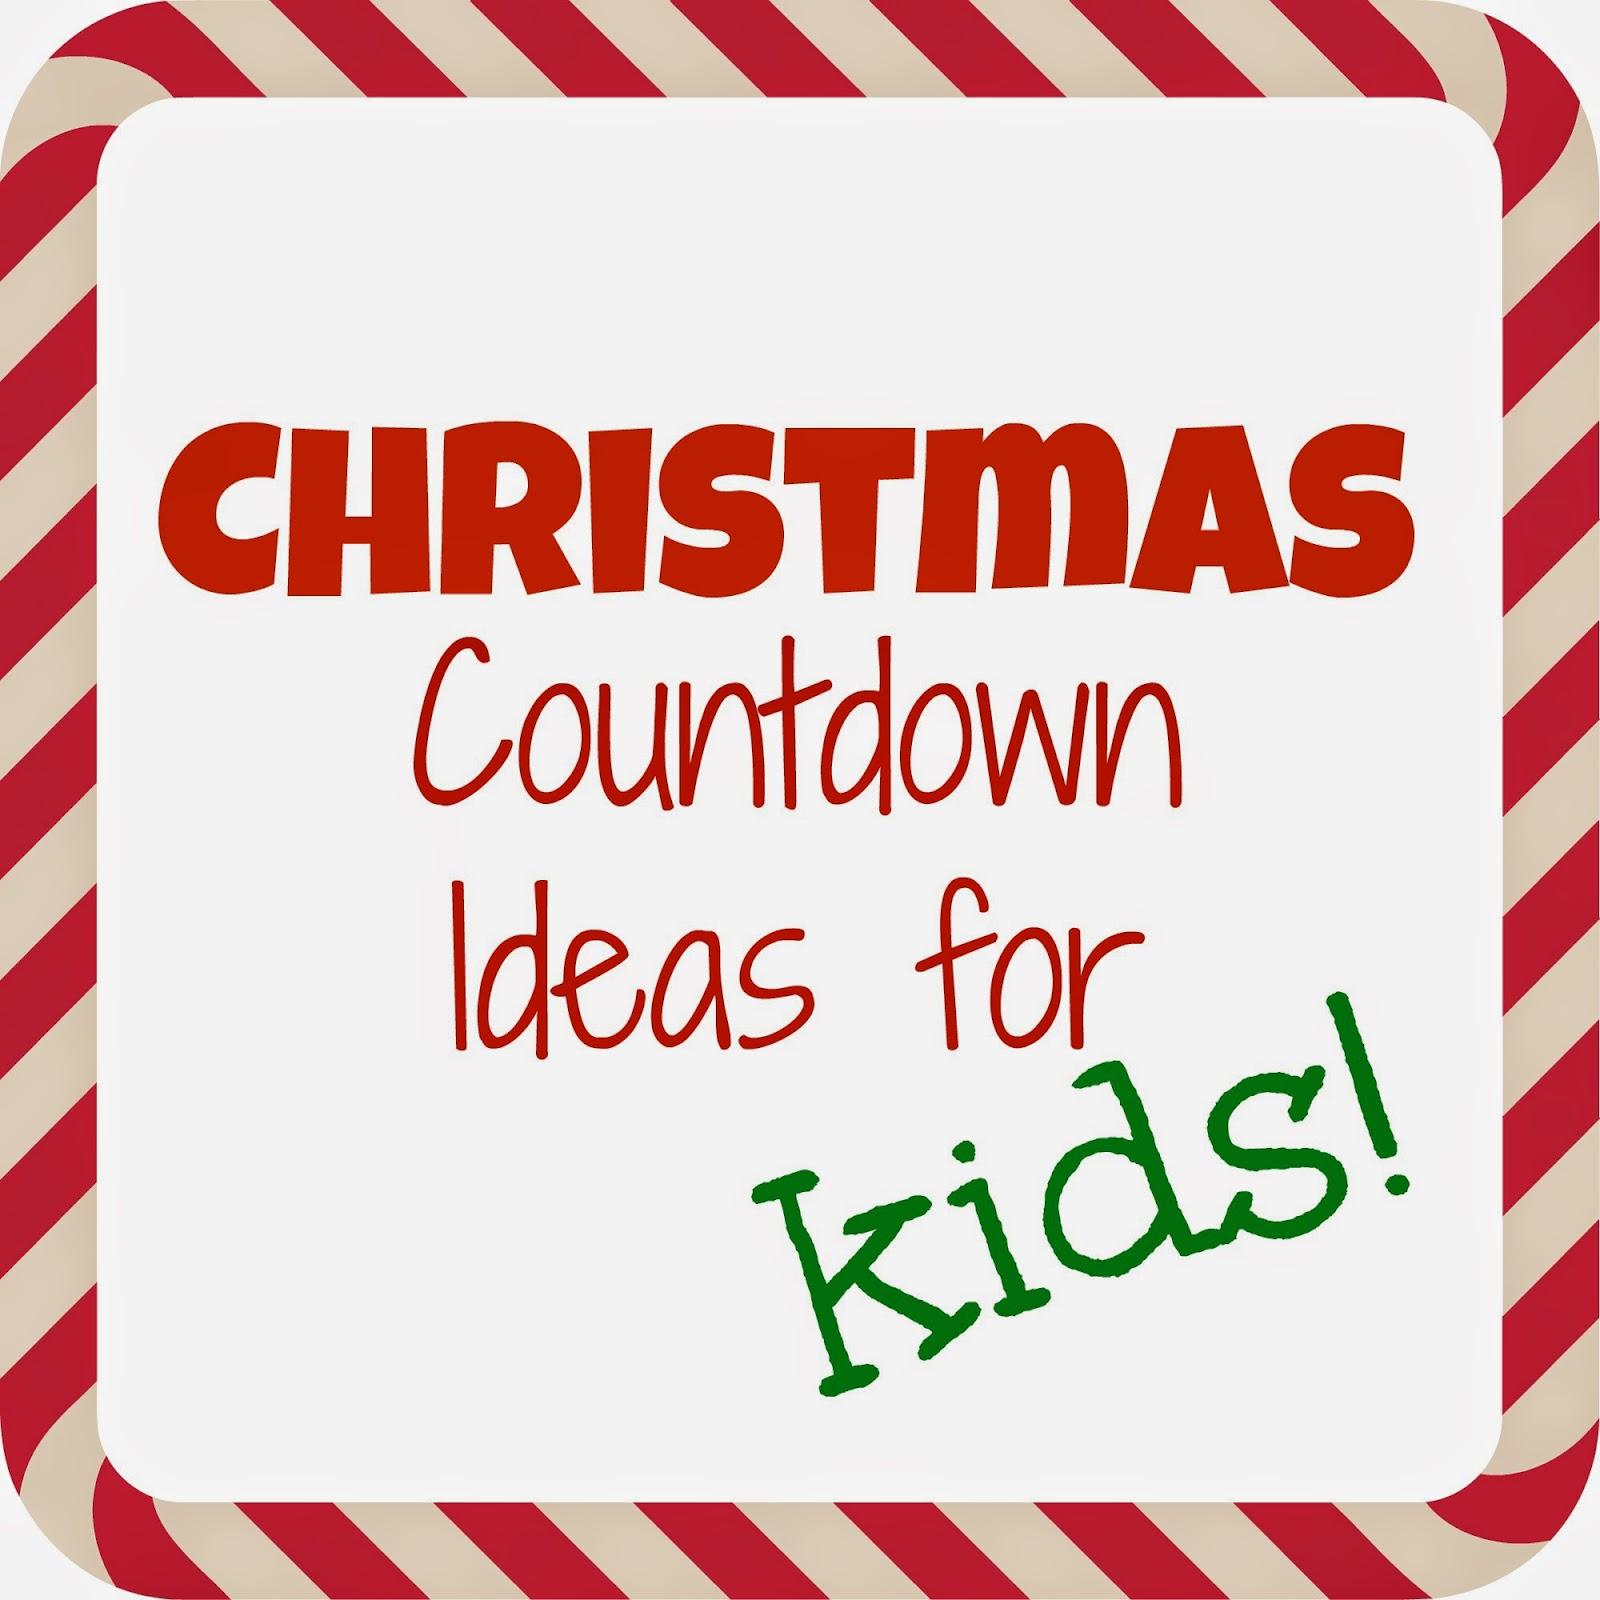 christmas countdown ideas for kids - Christmas Countdown Ideas